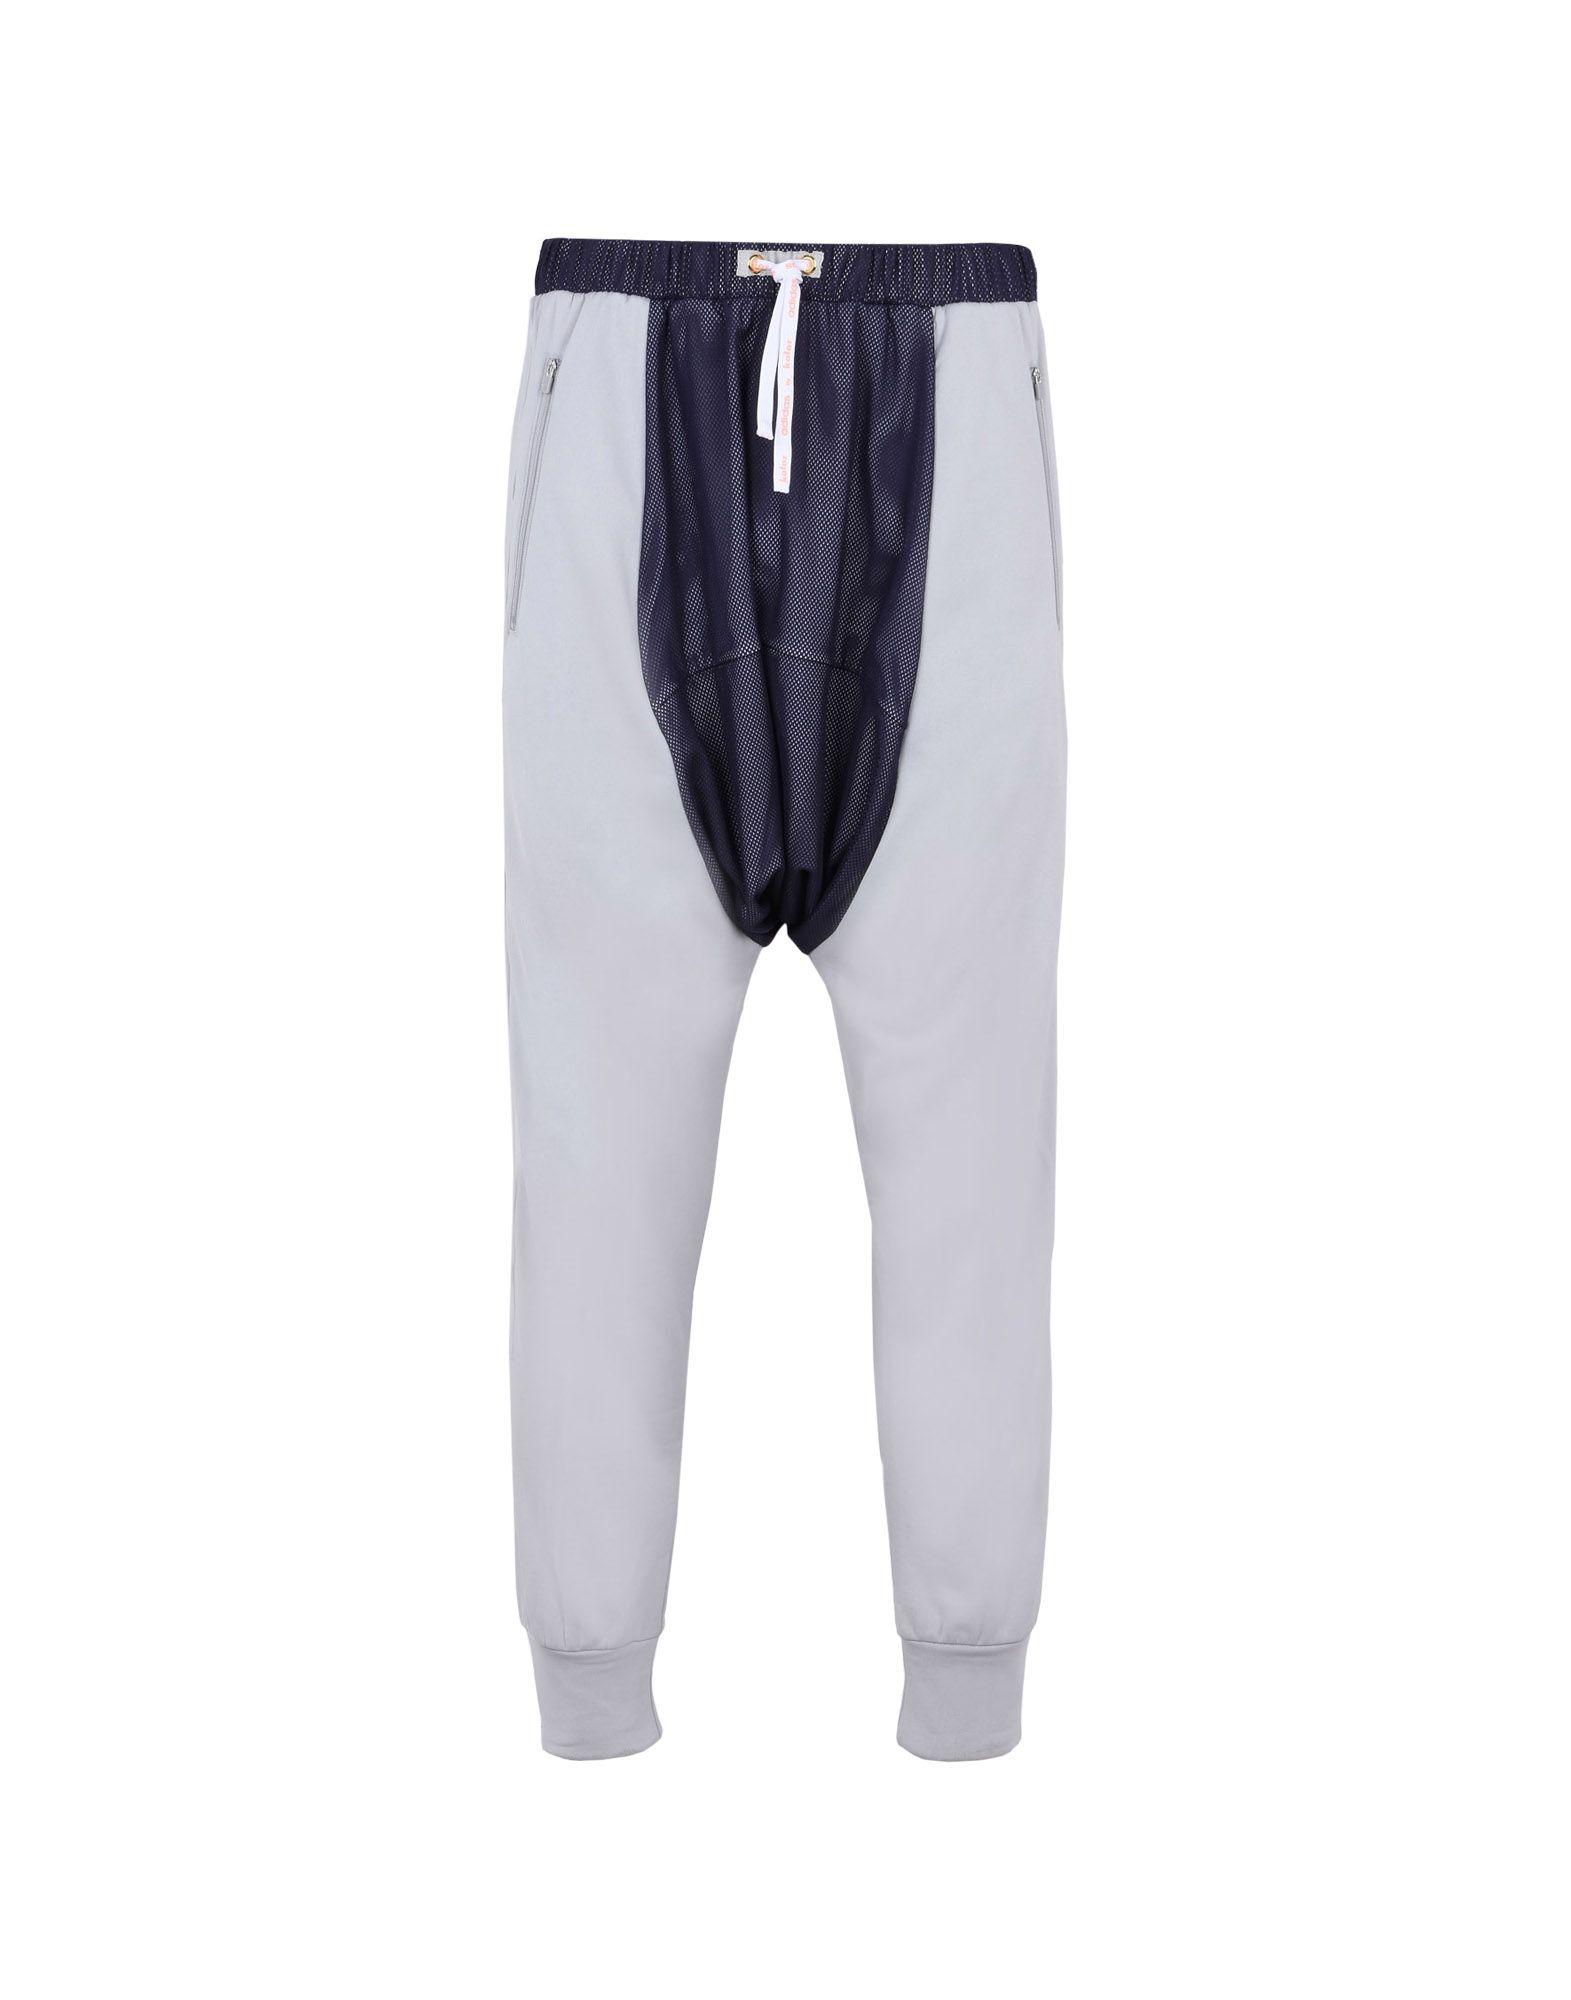 pantalon adidas hommes gris